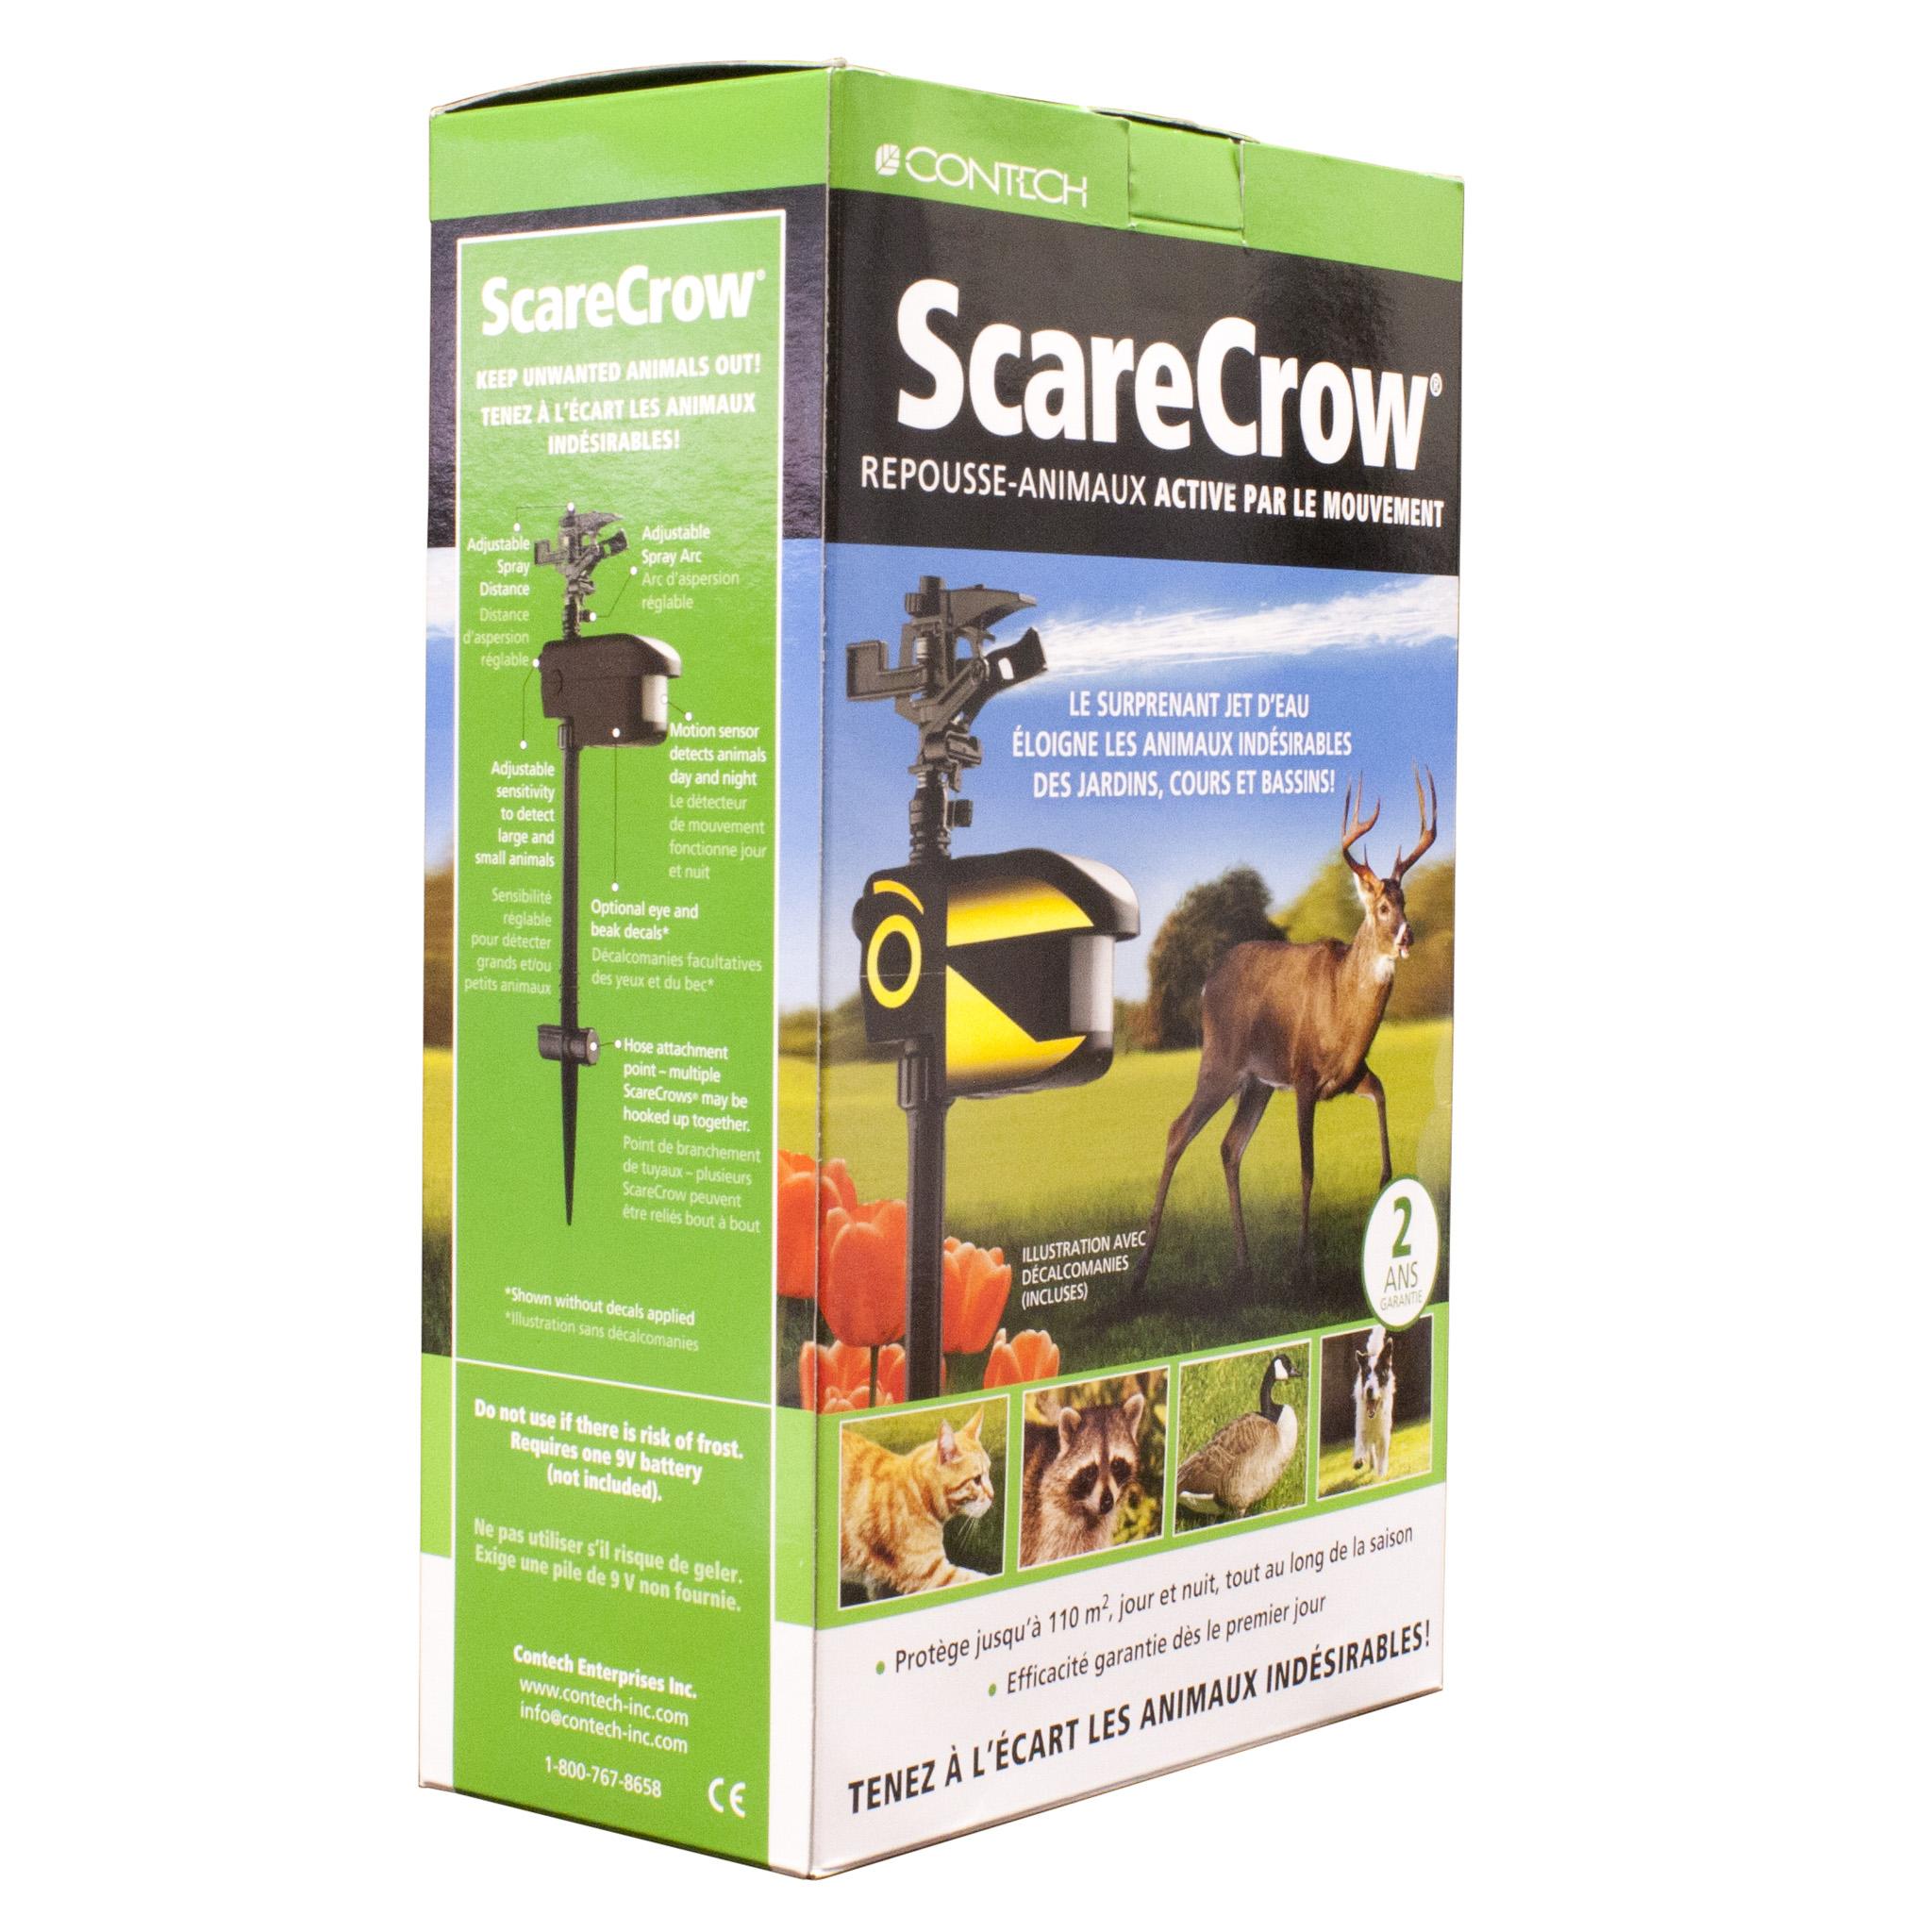 scarecrow sprinkler motion activated motion sensor sprinkler Water Scarecrow Motion Activated Sprinkler scarecrow sprinkler motion activated animal deterrent